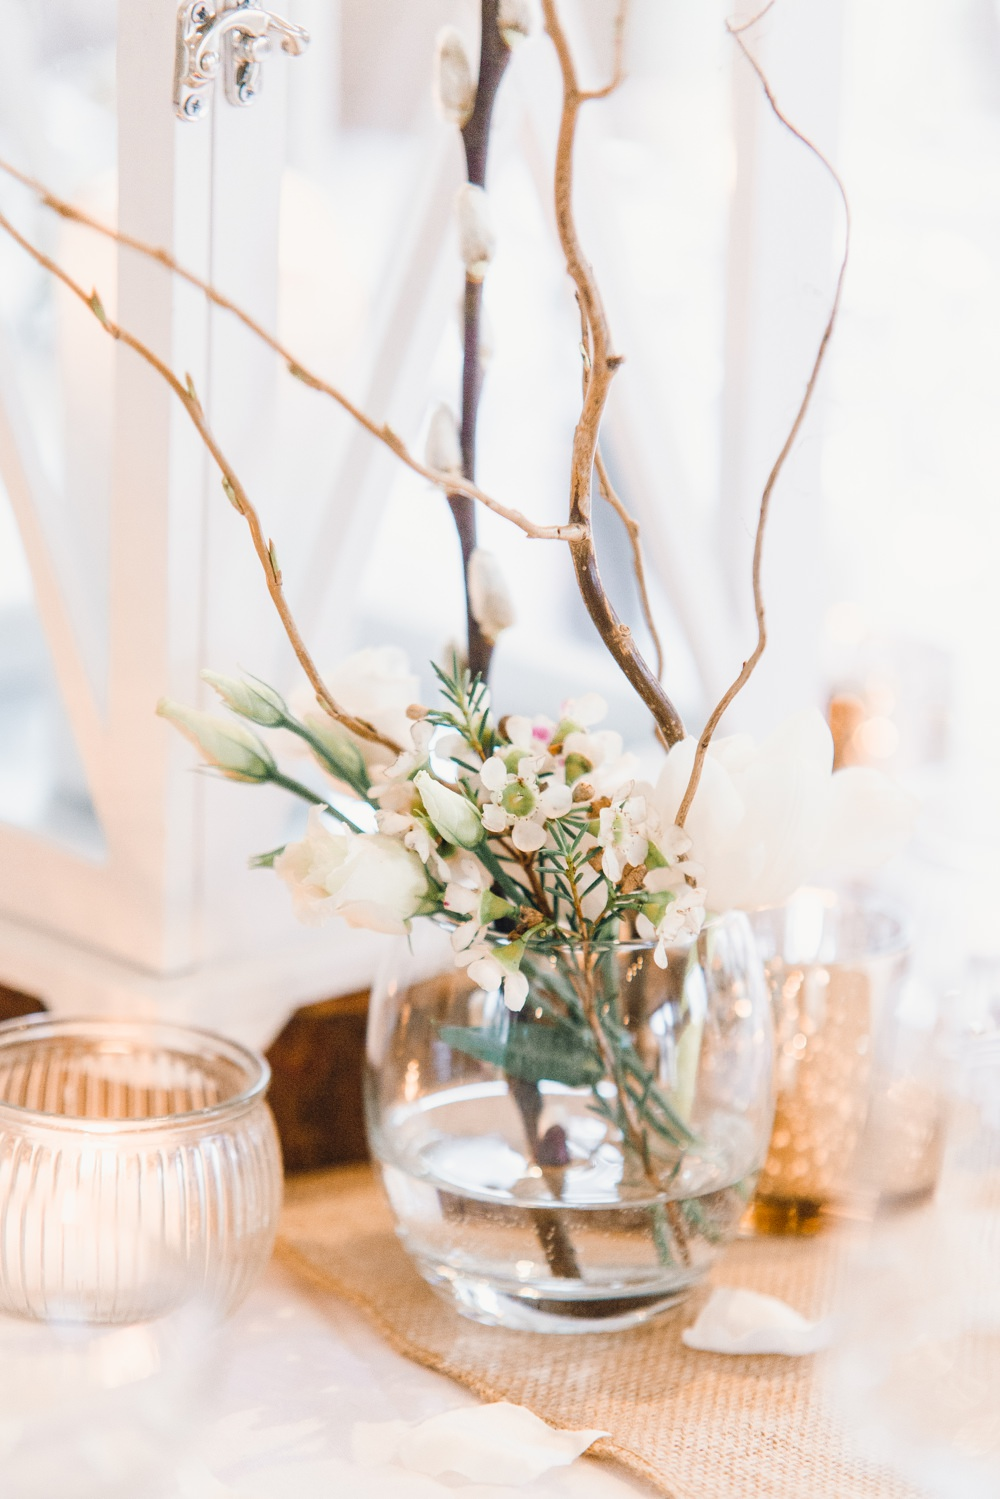 Table Decor Hessian Burlap Lantern Candle Cenrrepiece Branch Flowers Llanrhaeadr Springs Wedding Jessica Reeve Photography